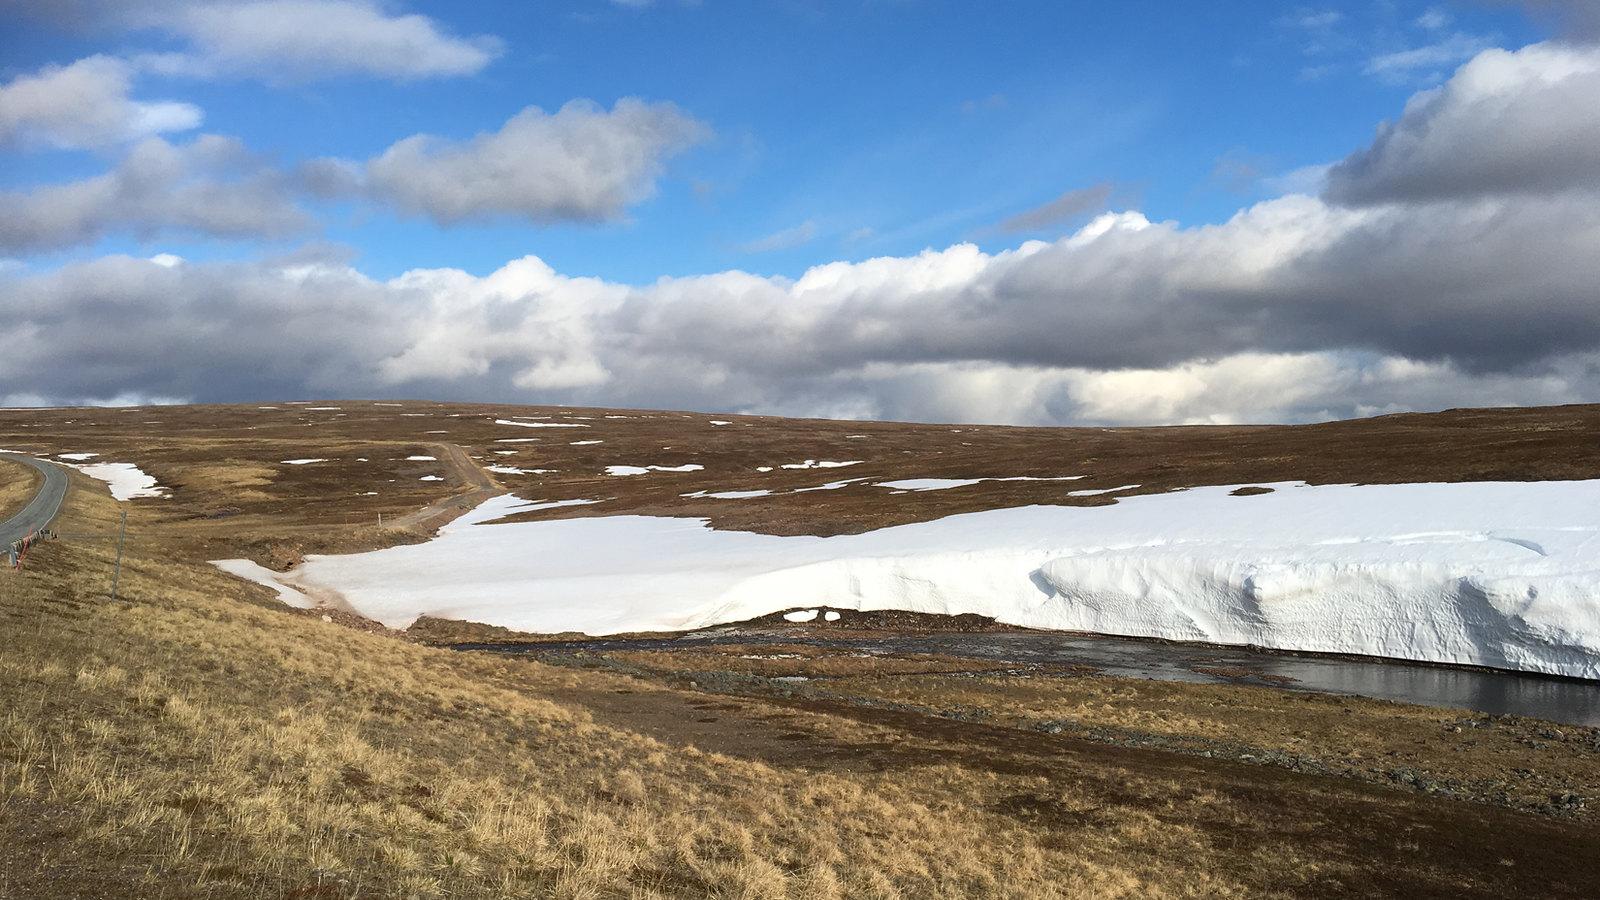 Varanger snow and ice